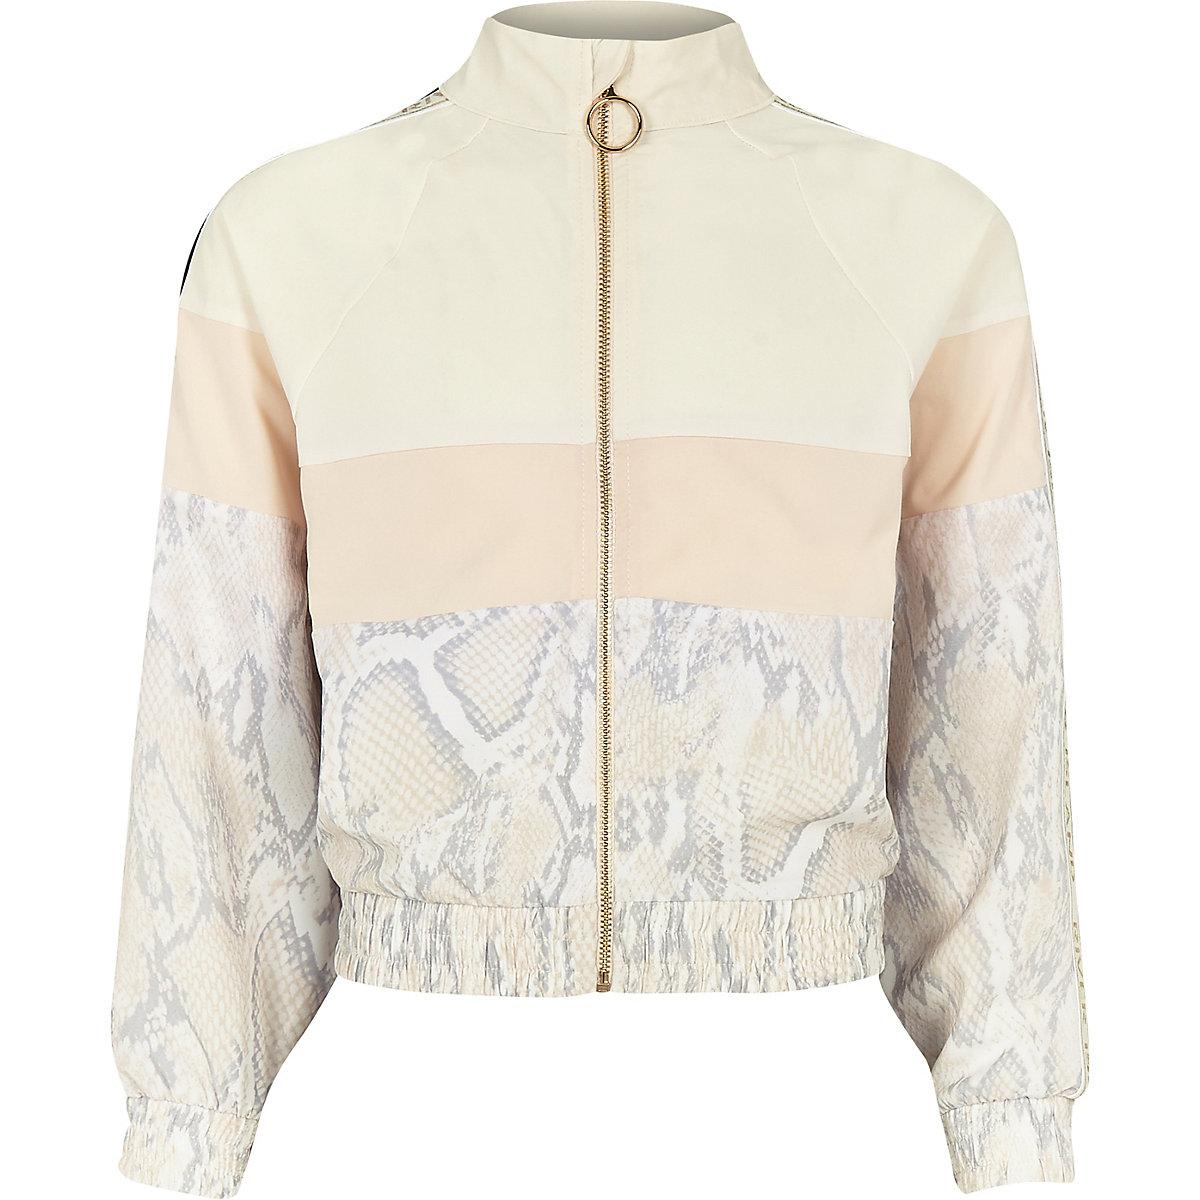 Girls RI Active white snake track jacket